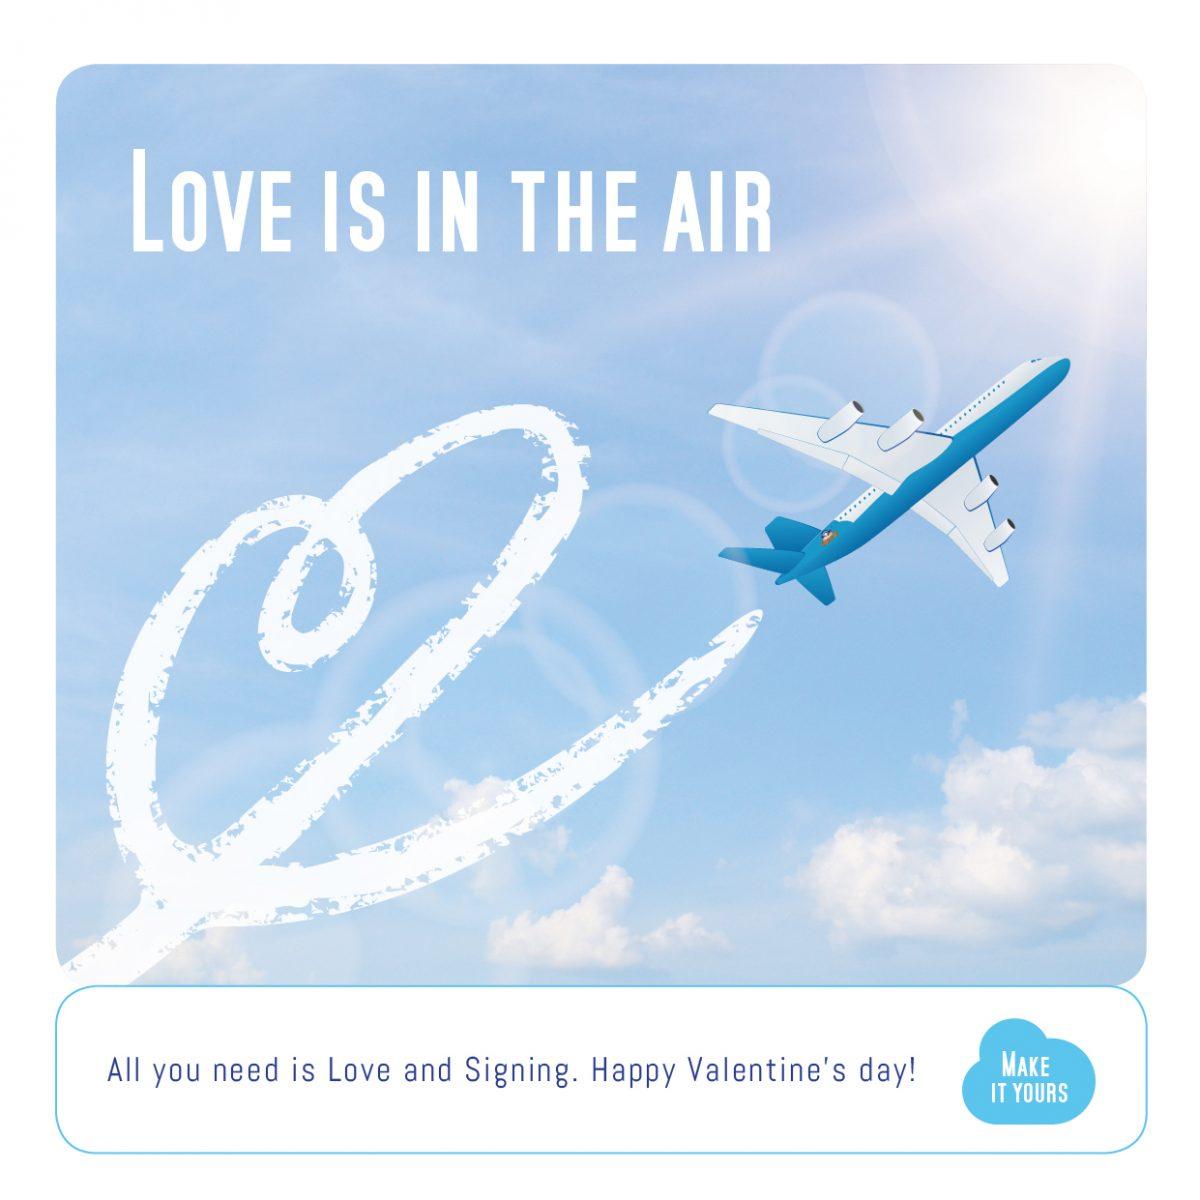 Signcraft-rotterdam-love-signing-valentijn